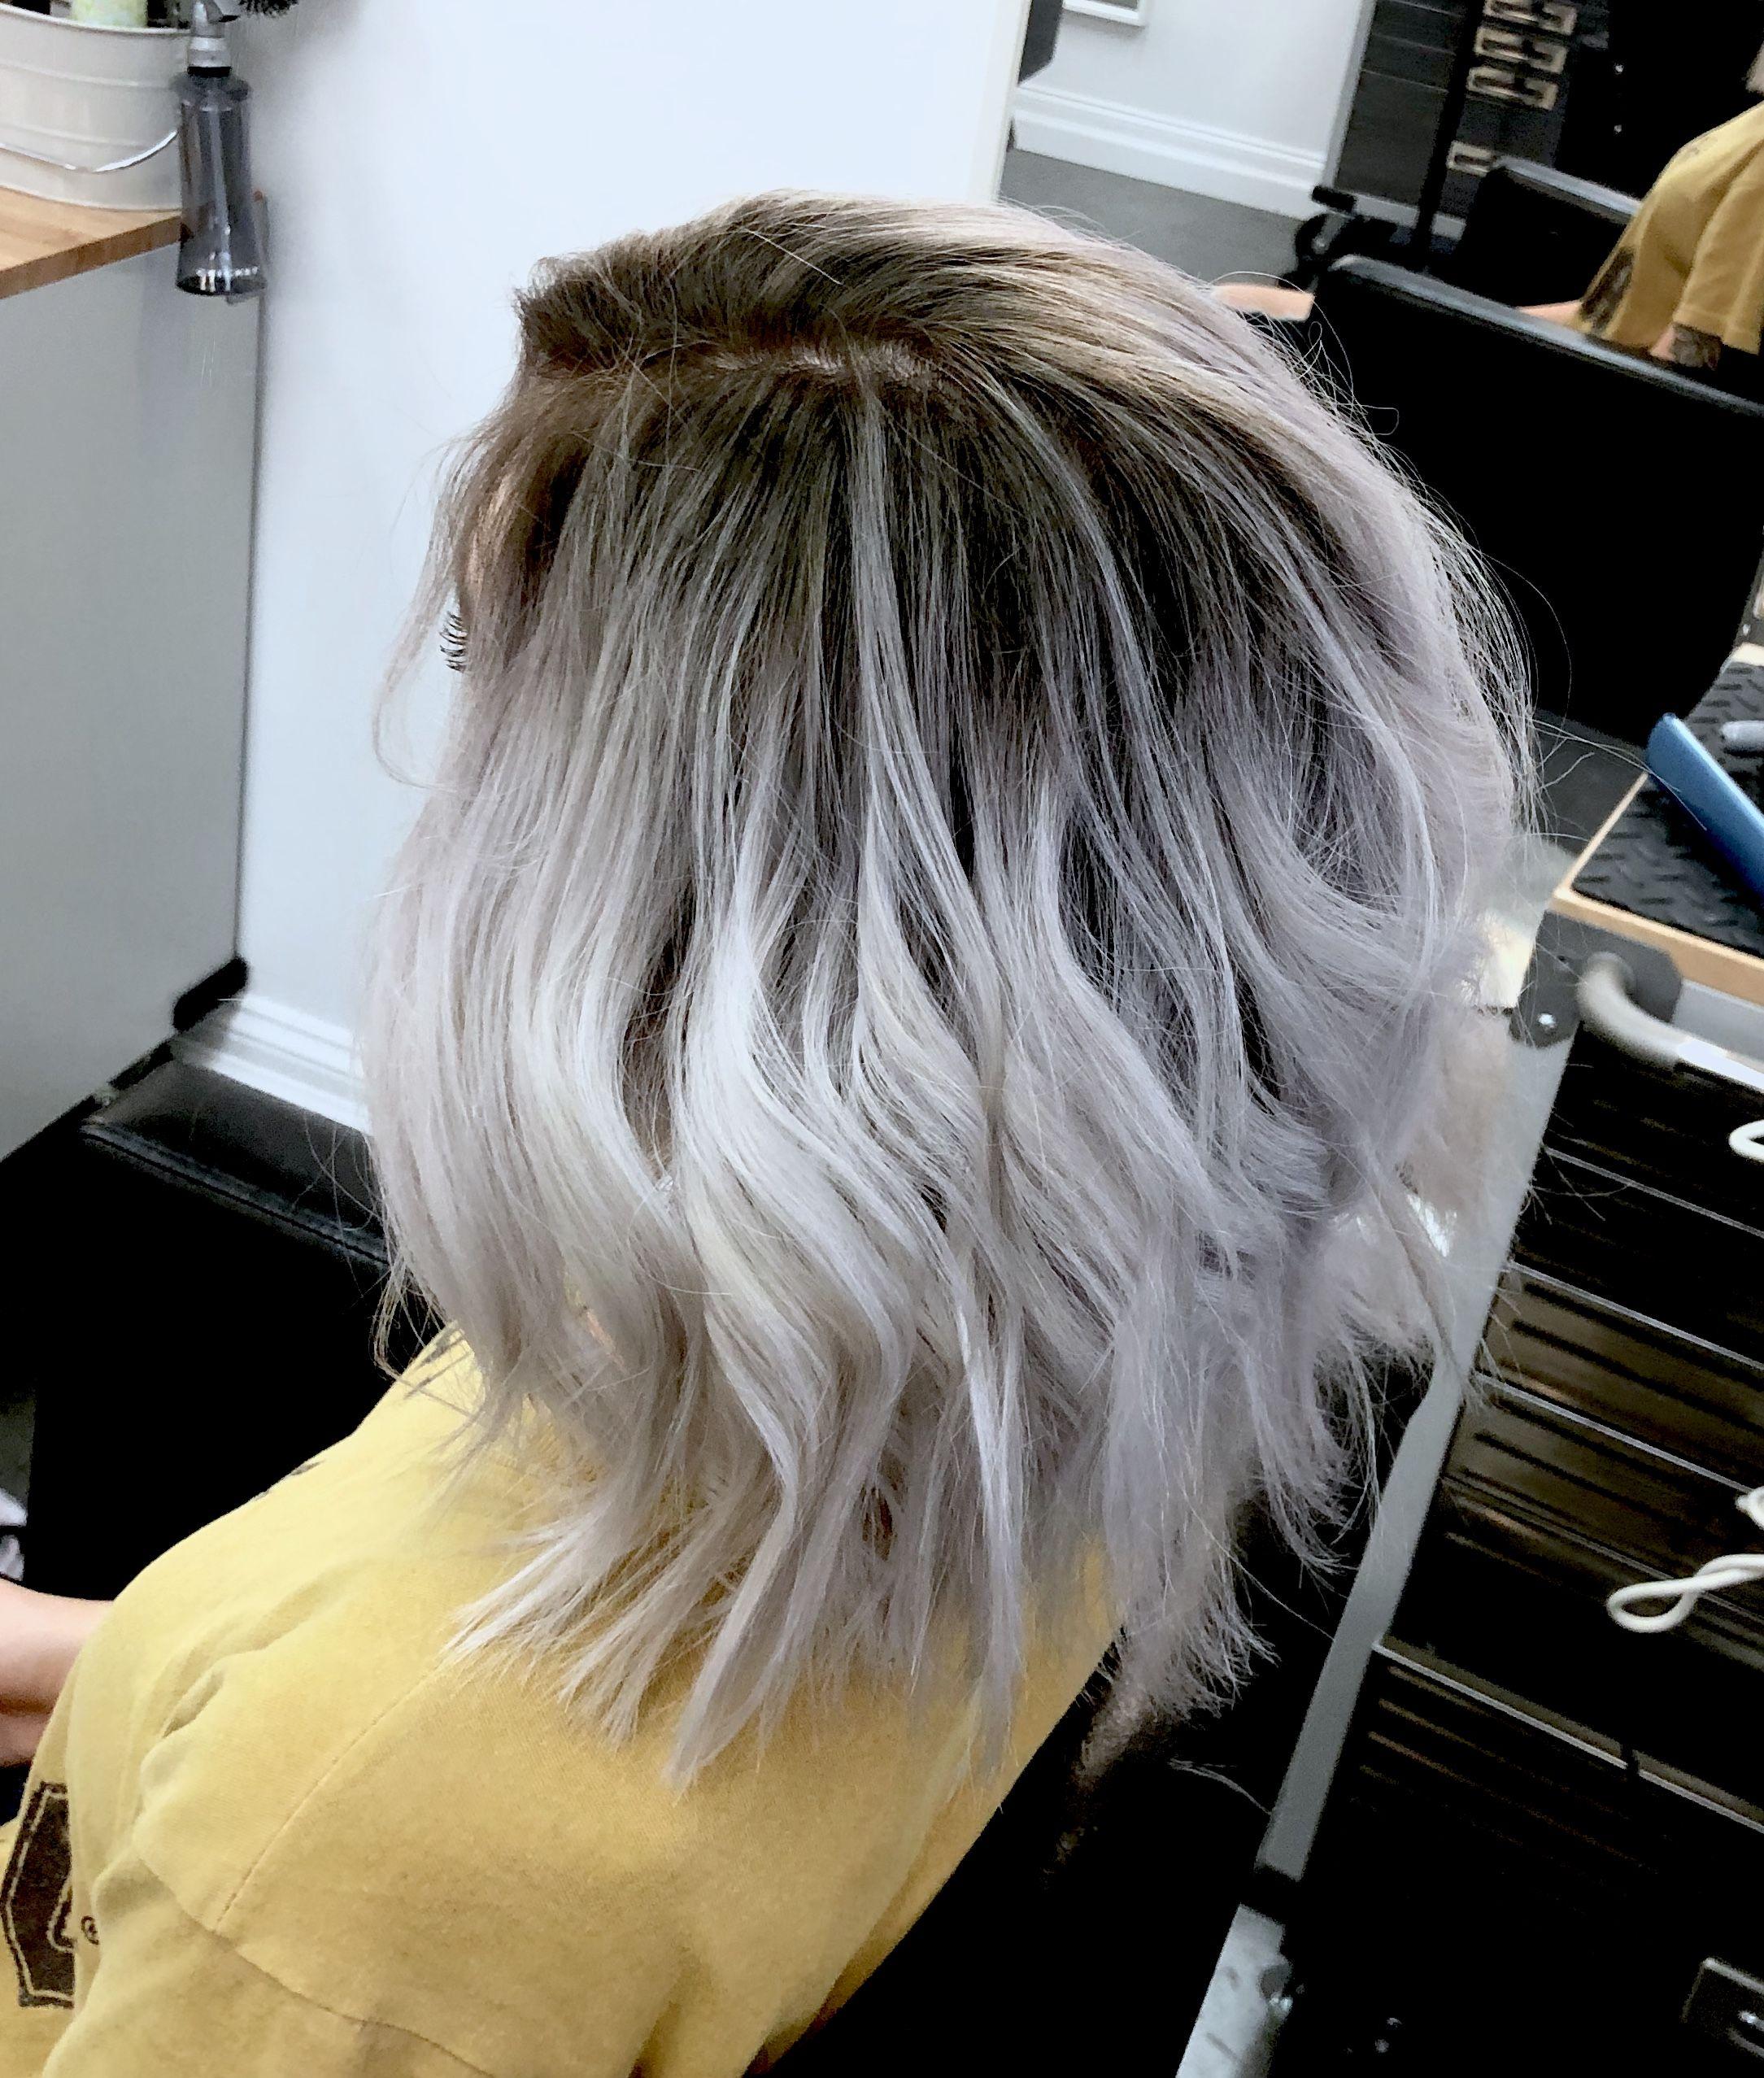 Platinum Blonde Going From Black To Blonde Hair